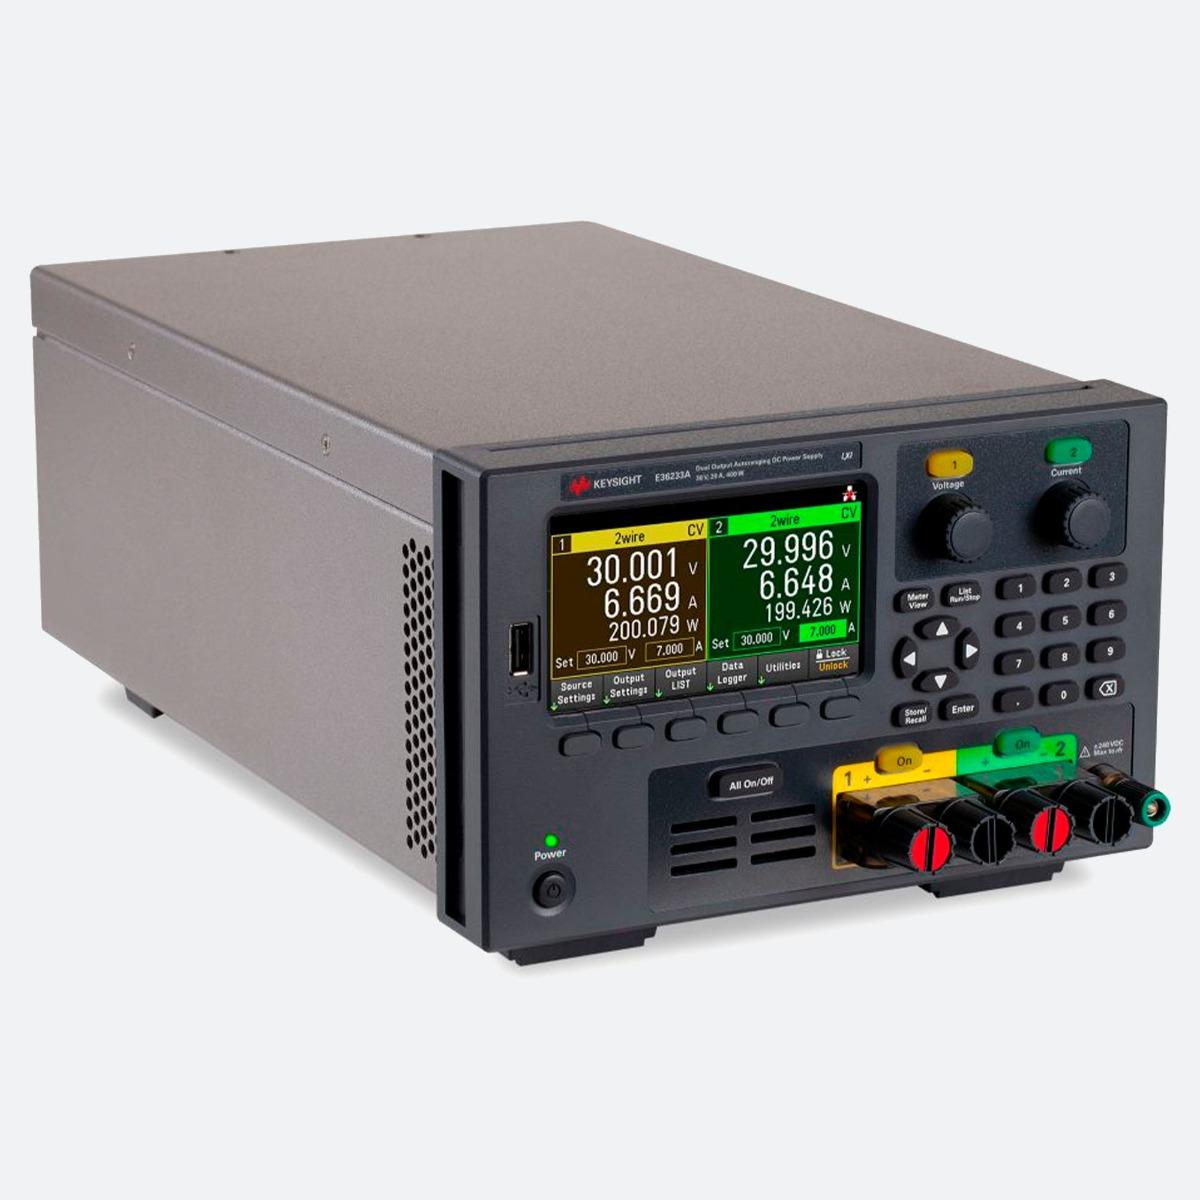 Keysight E36233A Power Supply CControls